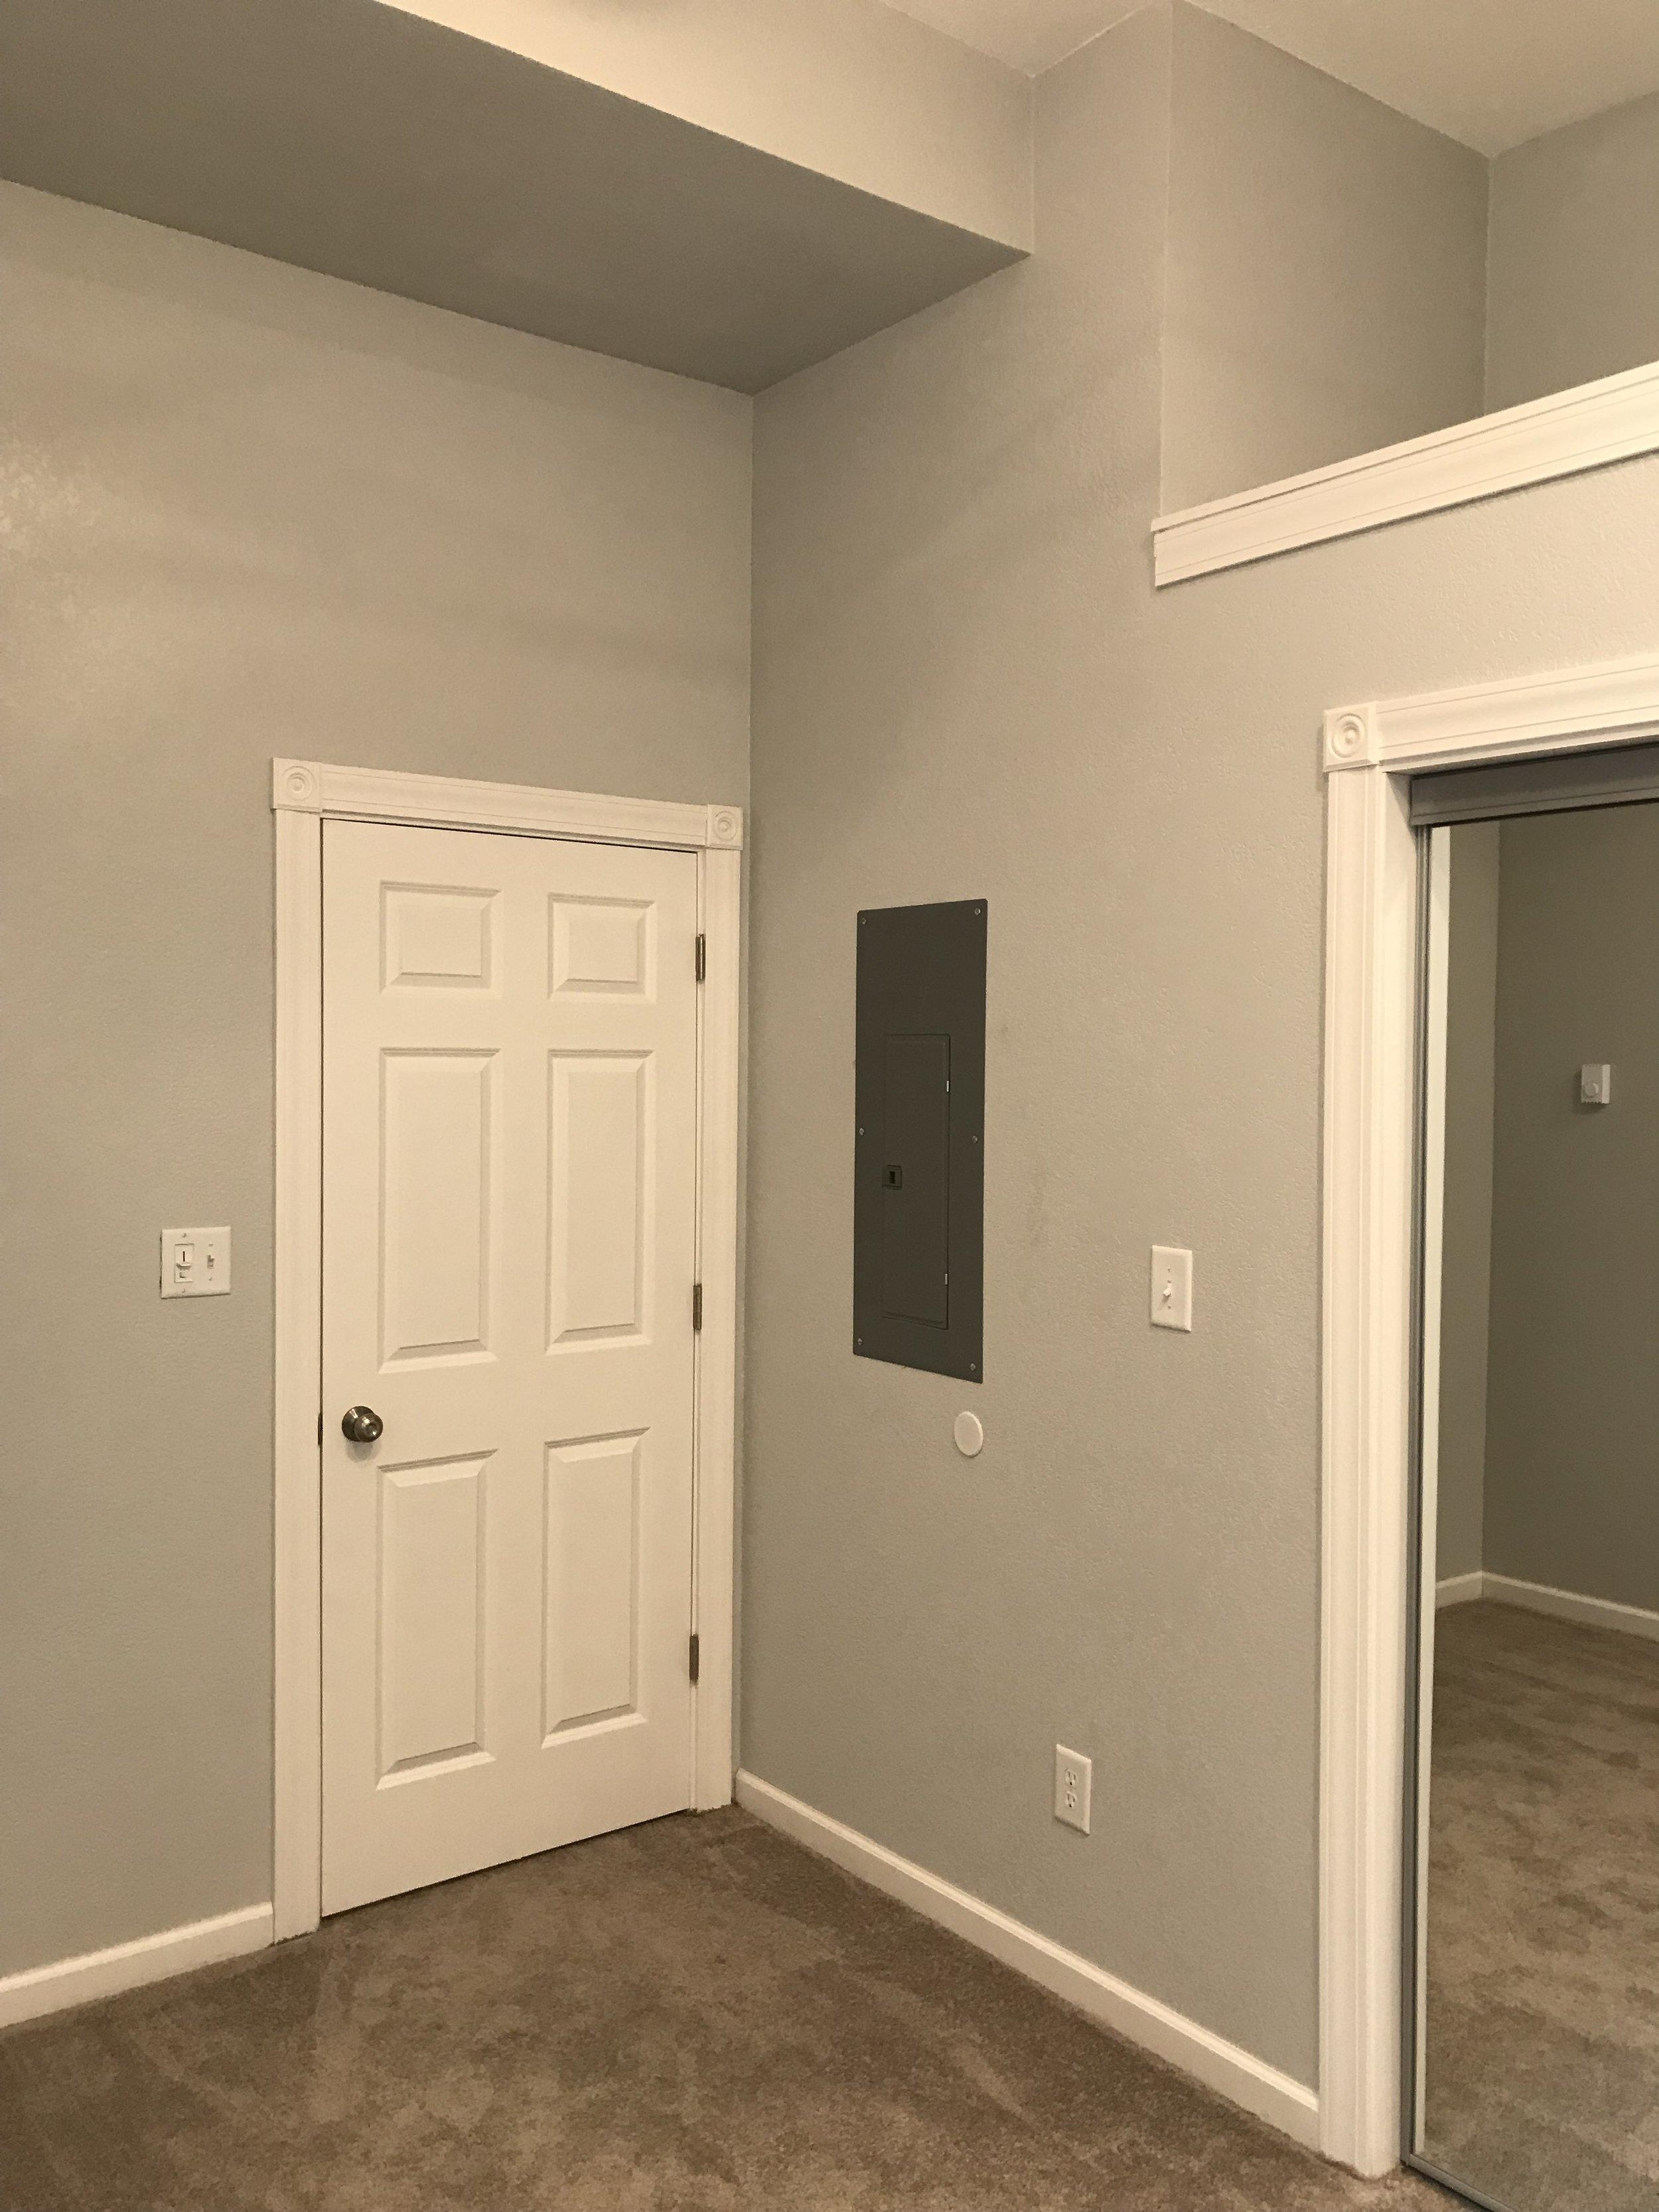 Bedroom - Extra Storage above closet